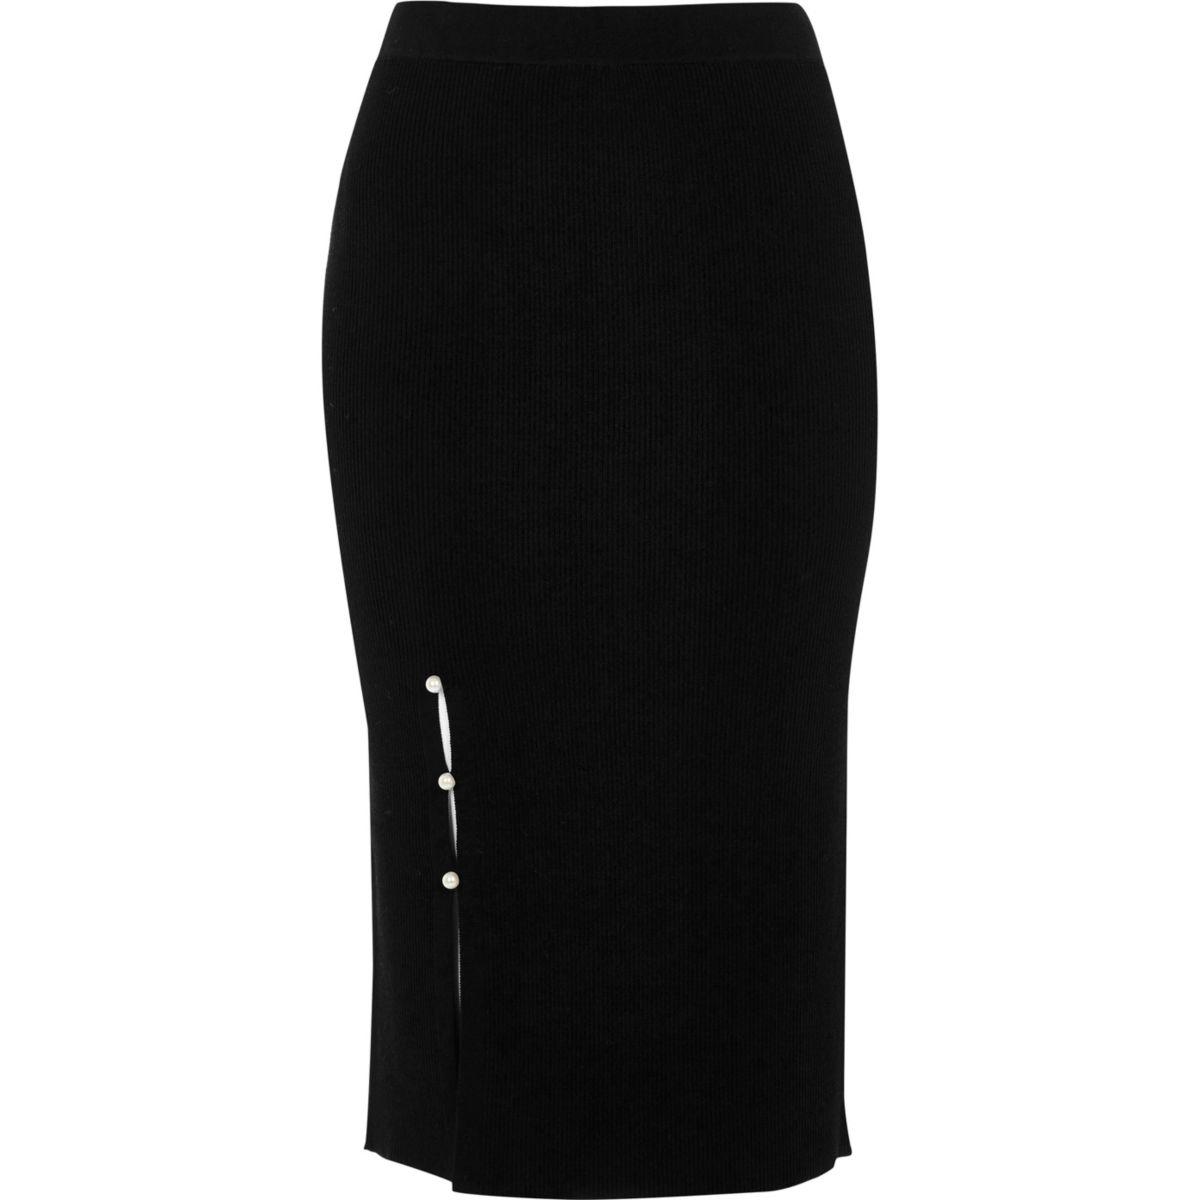 Black faux pearl split knitted pencil skirt